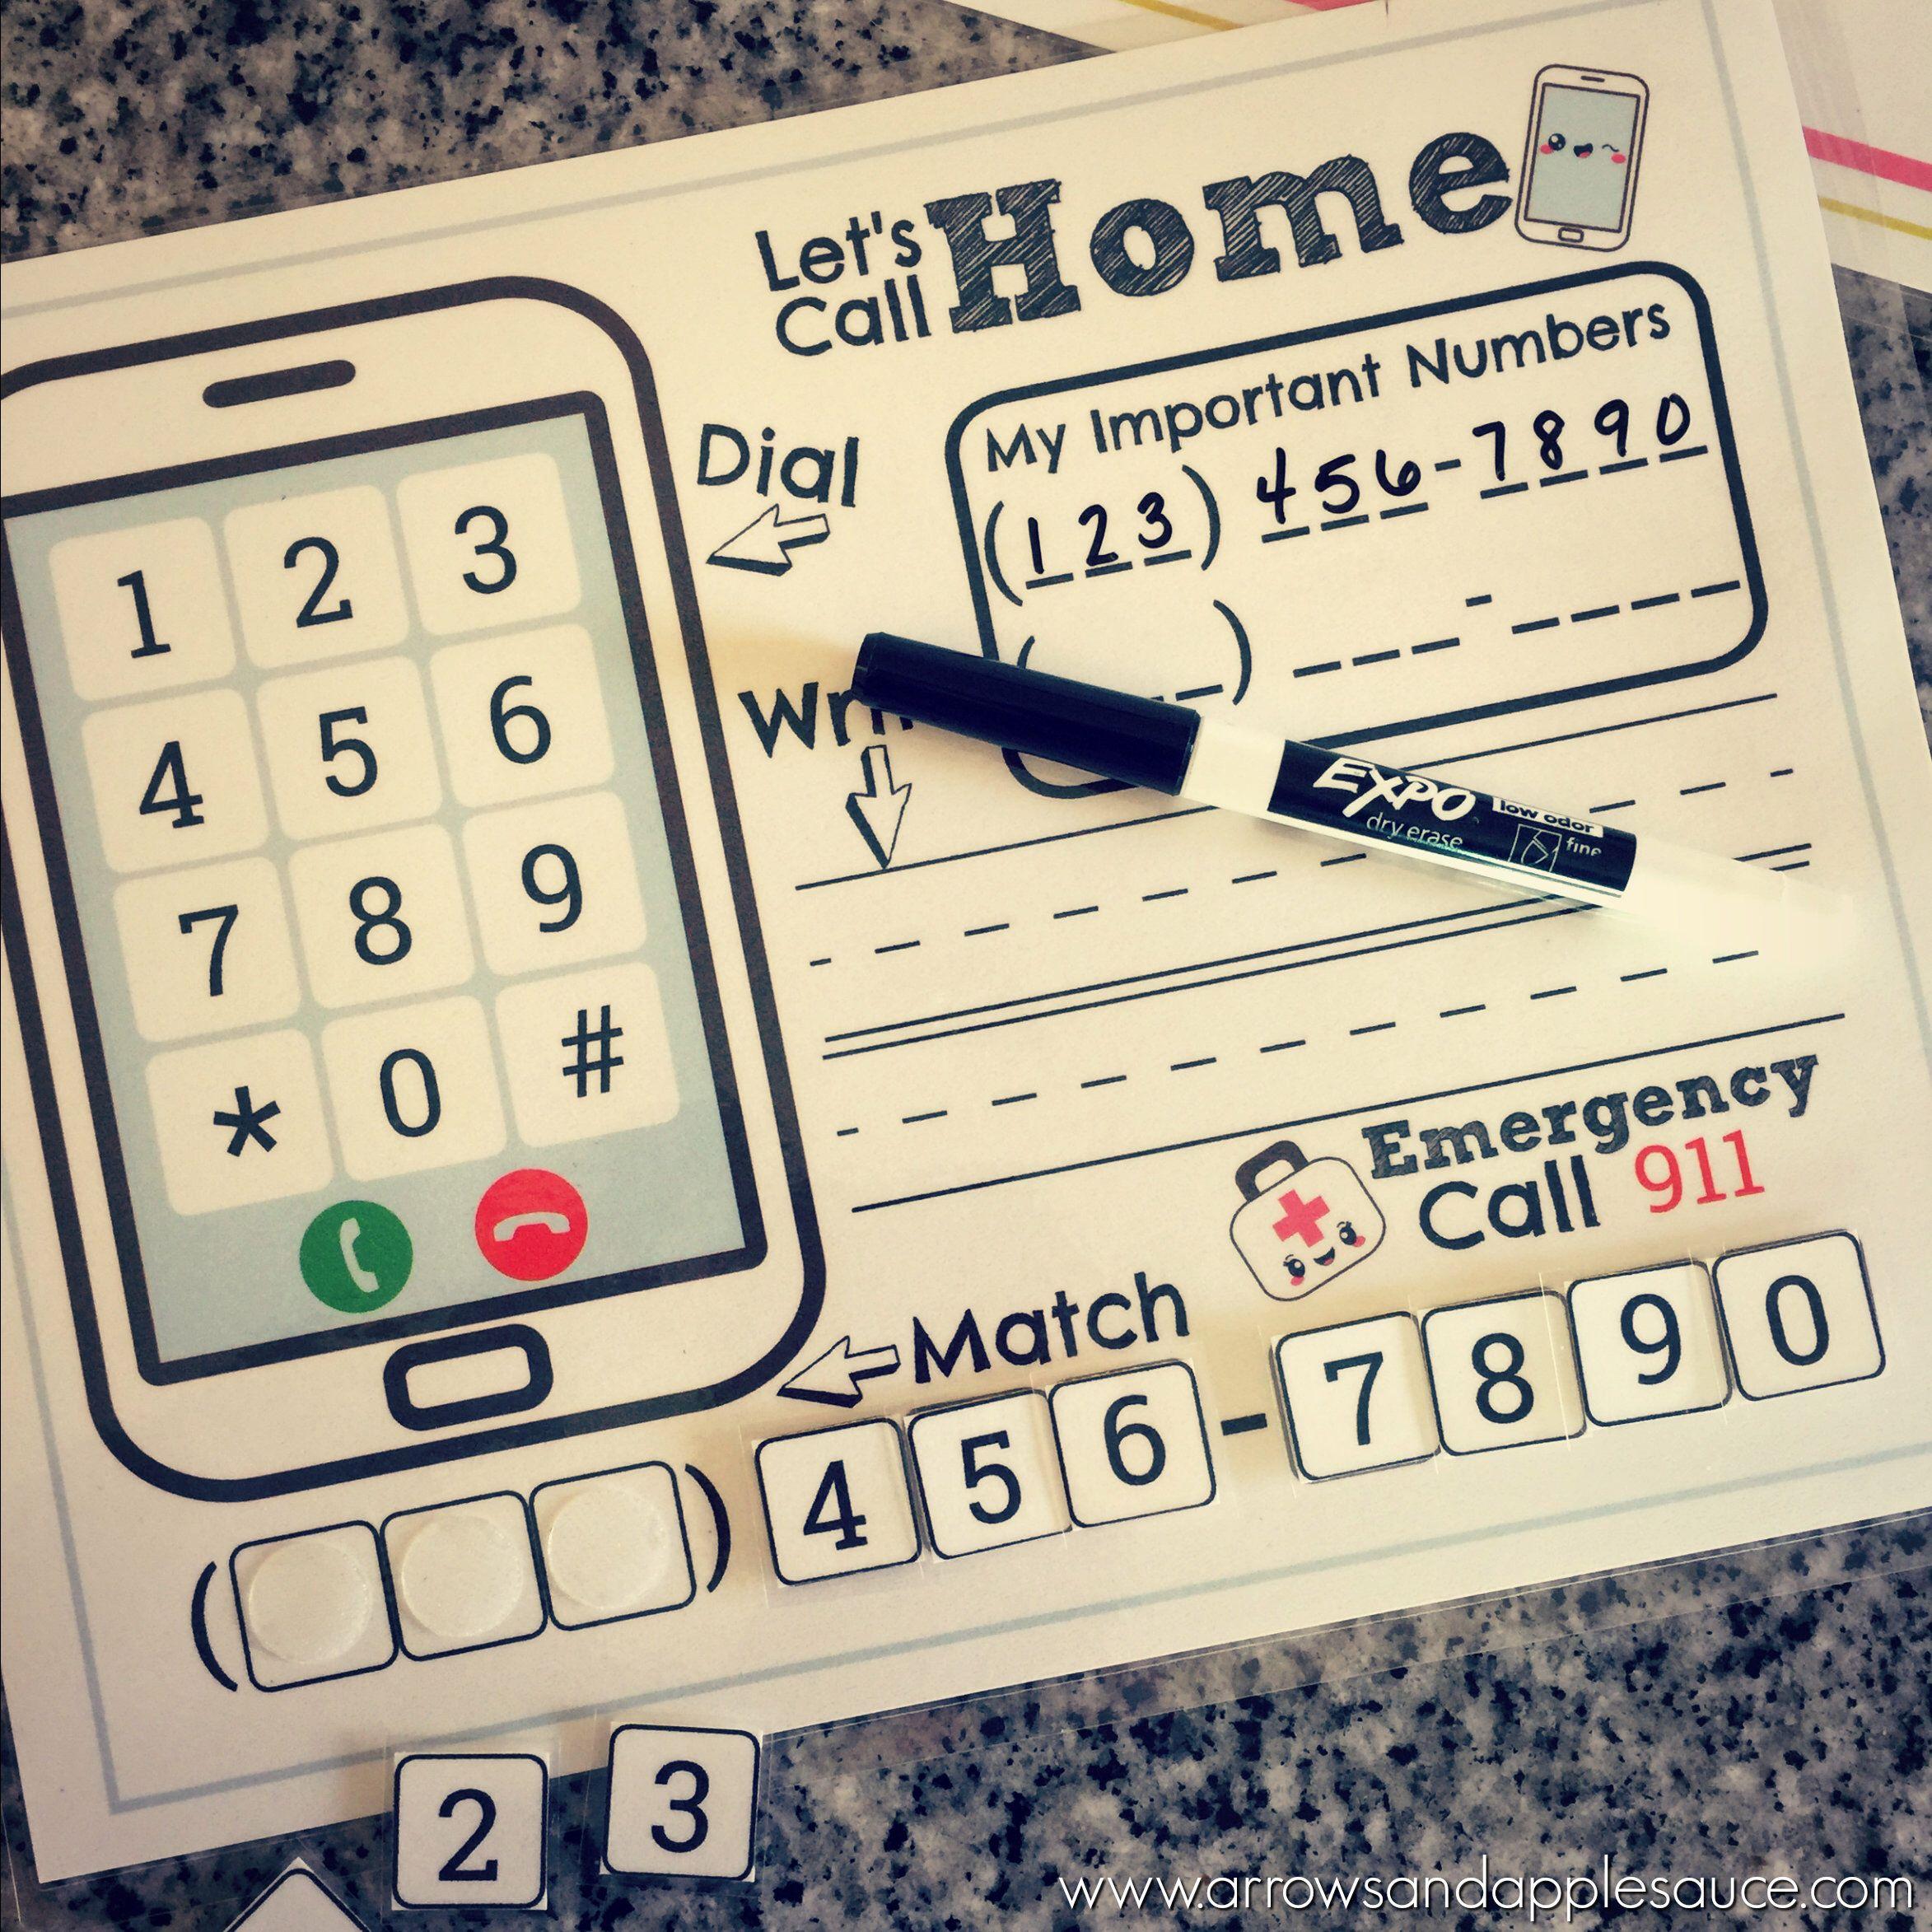 Phone Number Kids Activity Phone Number Practice About Me Learning Tool Printable Game Preschool Kindergarten Worksheet Homeschool Activities For Kids Learning Tools Phone Numbers [ 2346 x 2346 Pixel ]